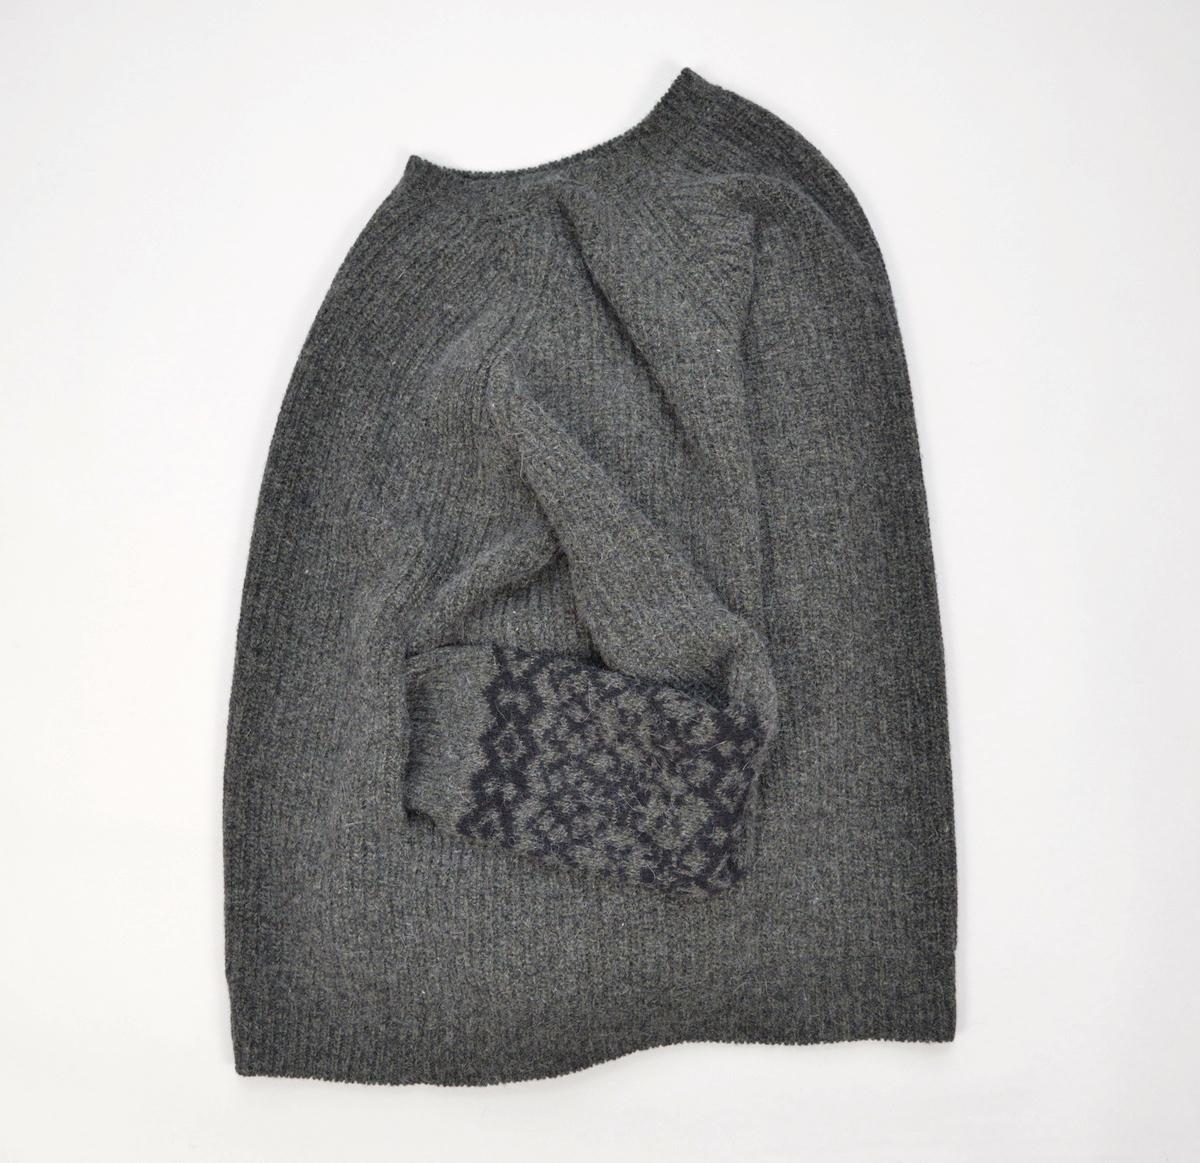 AUGUSTE-PRESENTATION 「 英国羊毛 × シルク・アンゴラニット / 寄木KHAKI 」